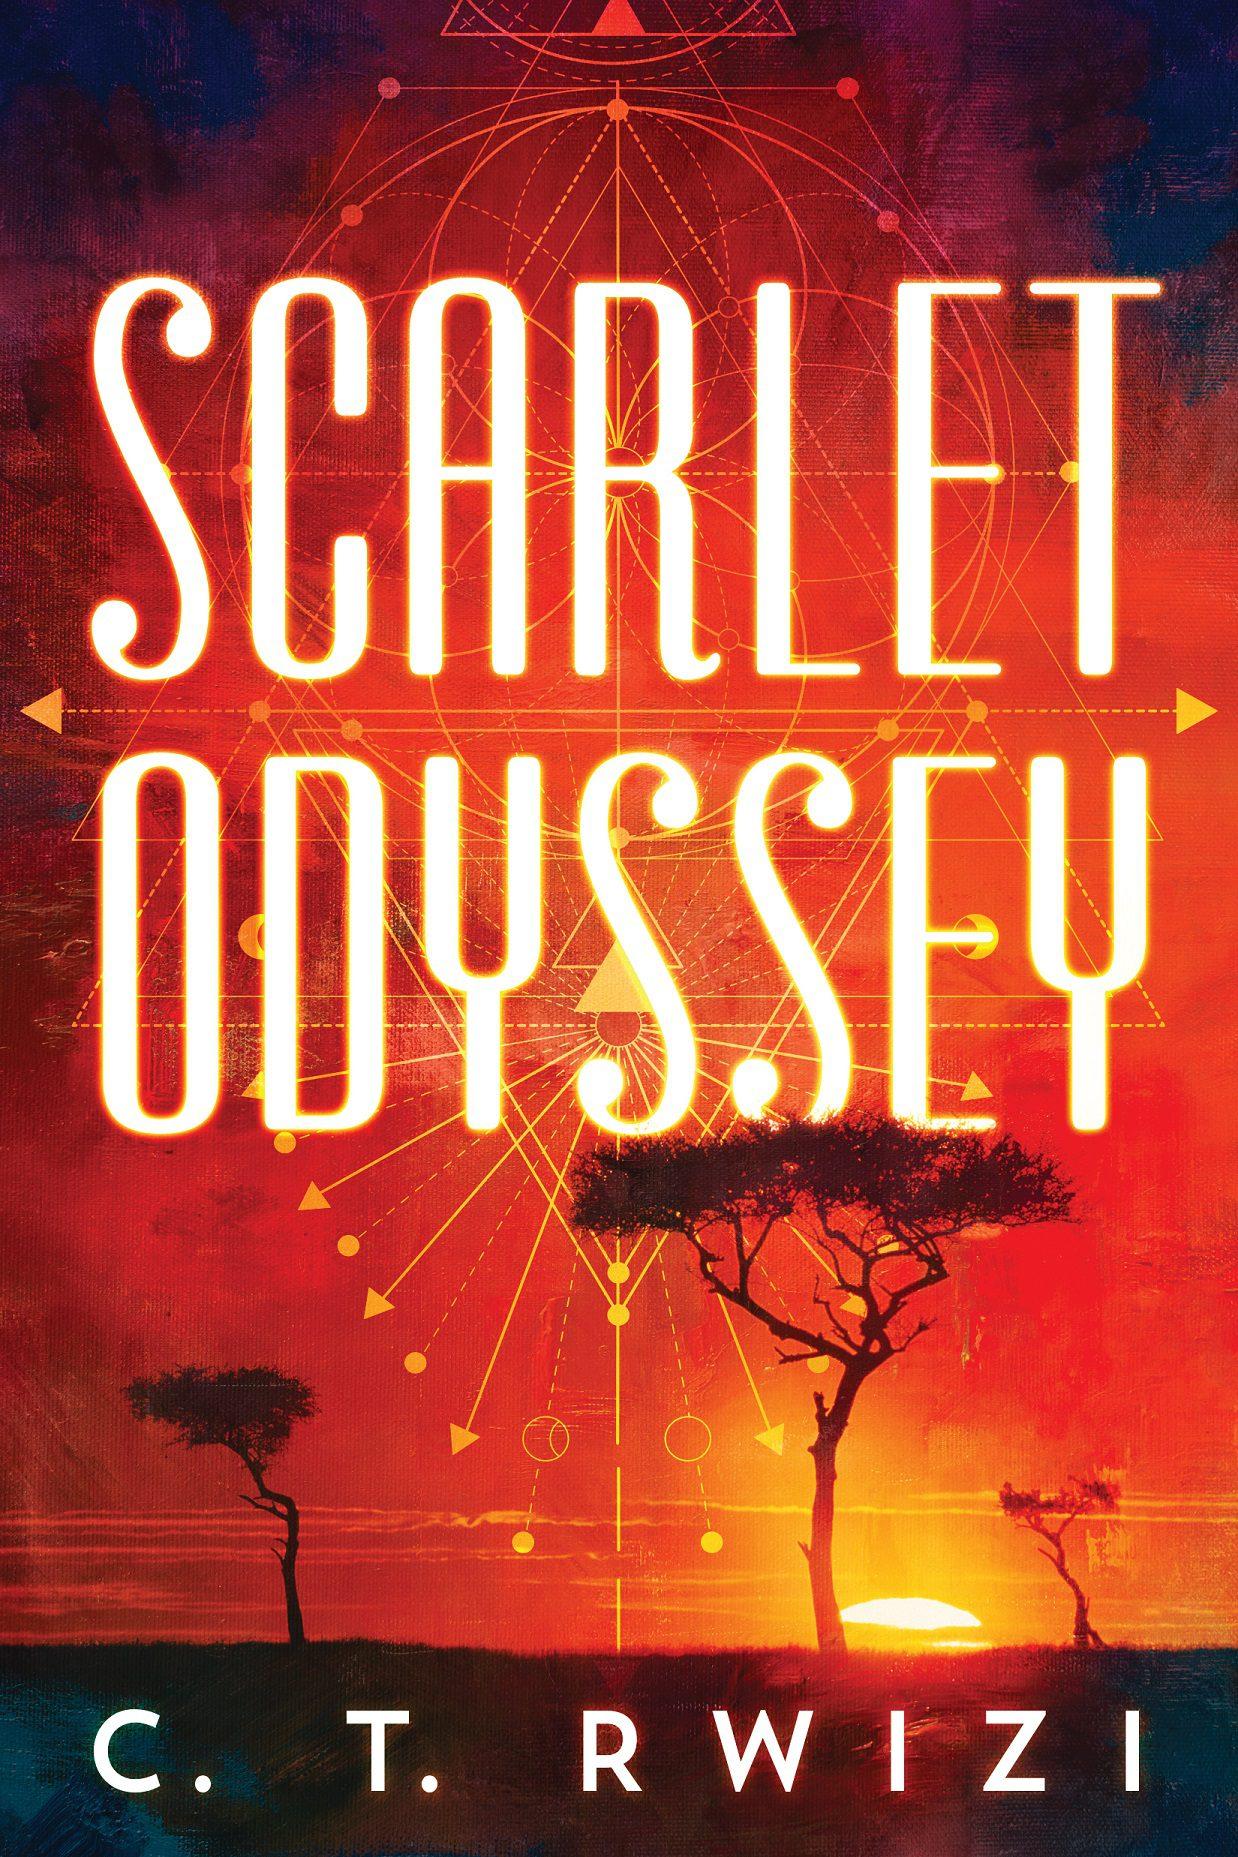 Scarlett Odyssey cover